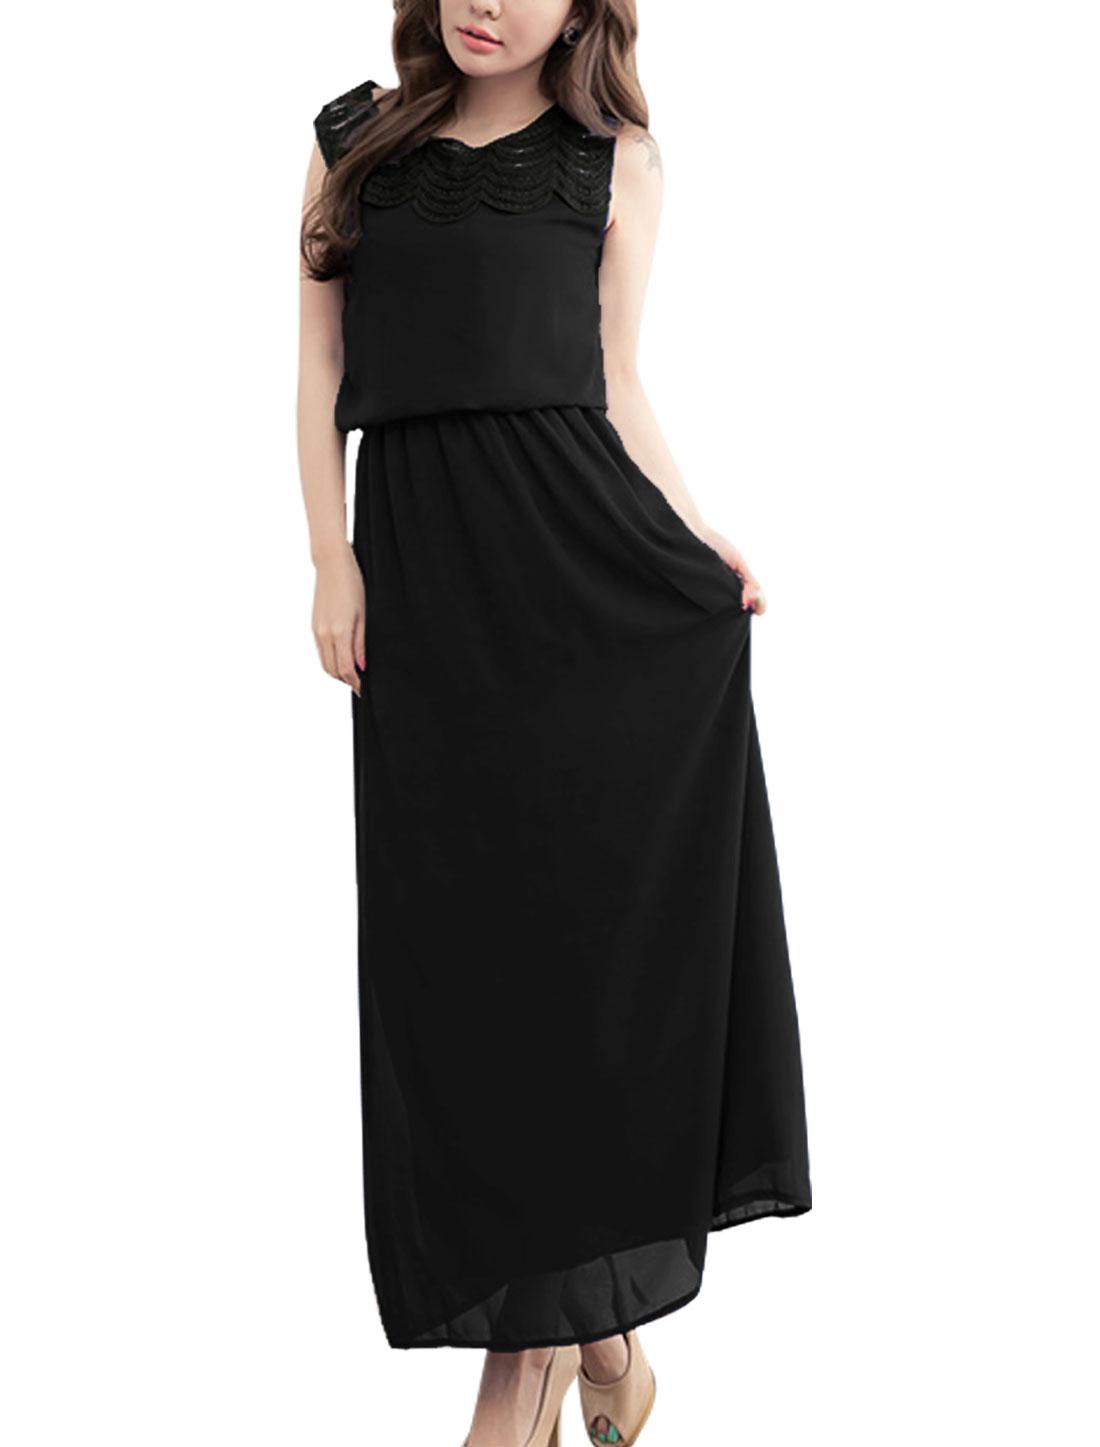 Lady Round Neck Crochet Panel Full-Length Blouson Dress Black XS